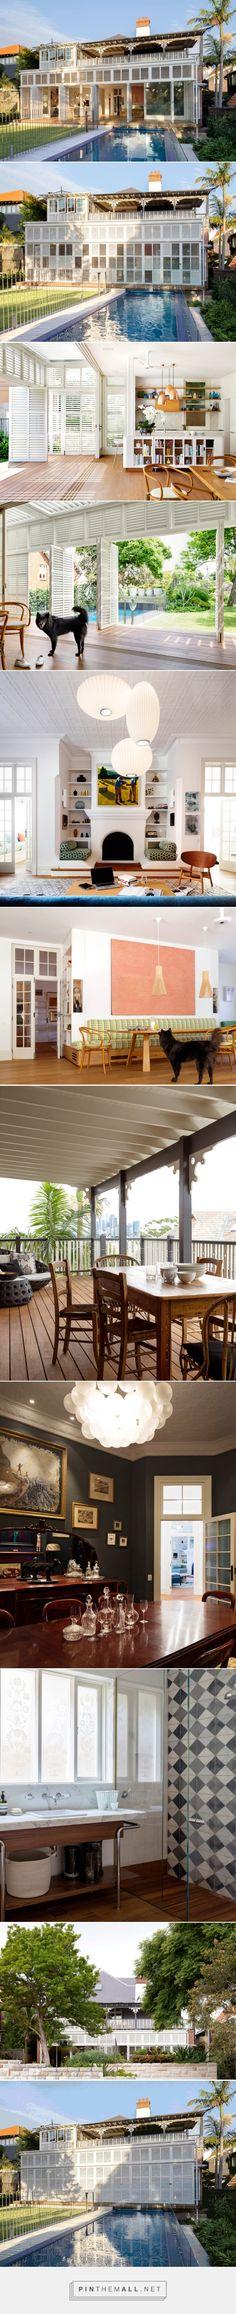 luigi rosselli reinvents sydney heritage house with retractable veranda - created via https://pinthemall.net